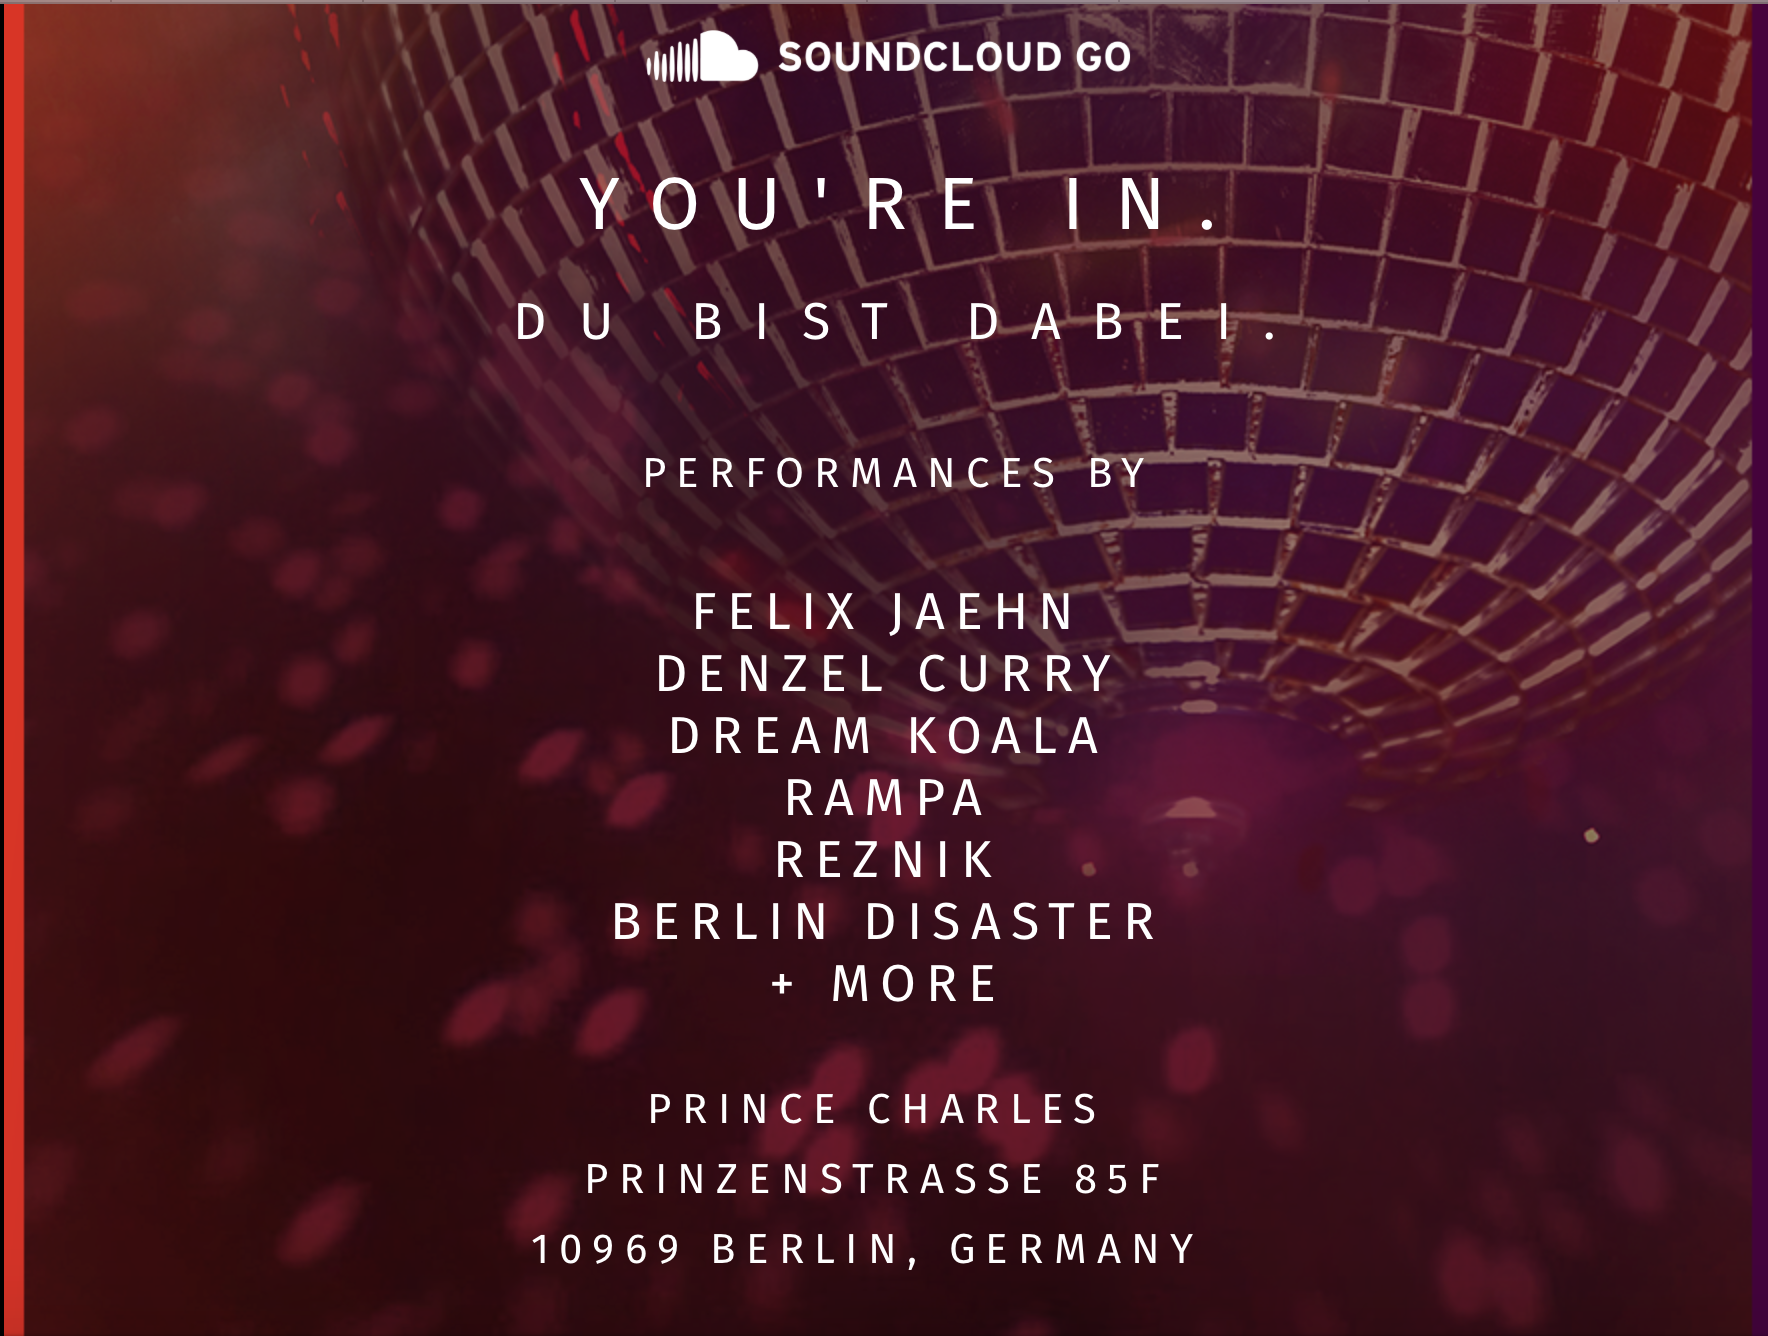 Soundcloud GO invitation